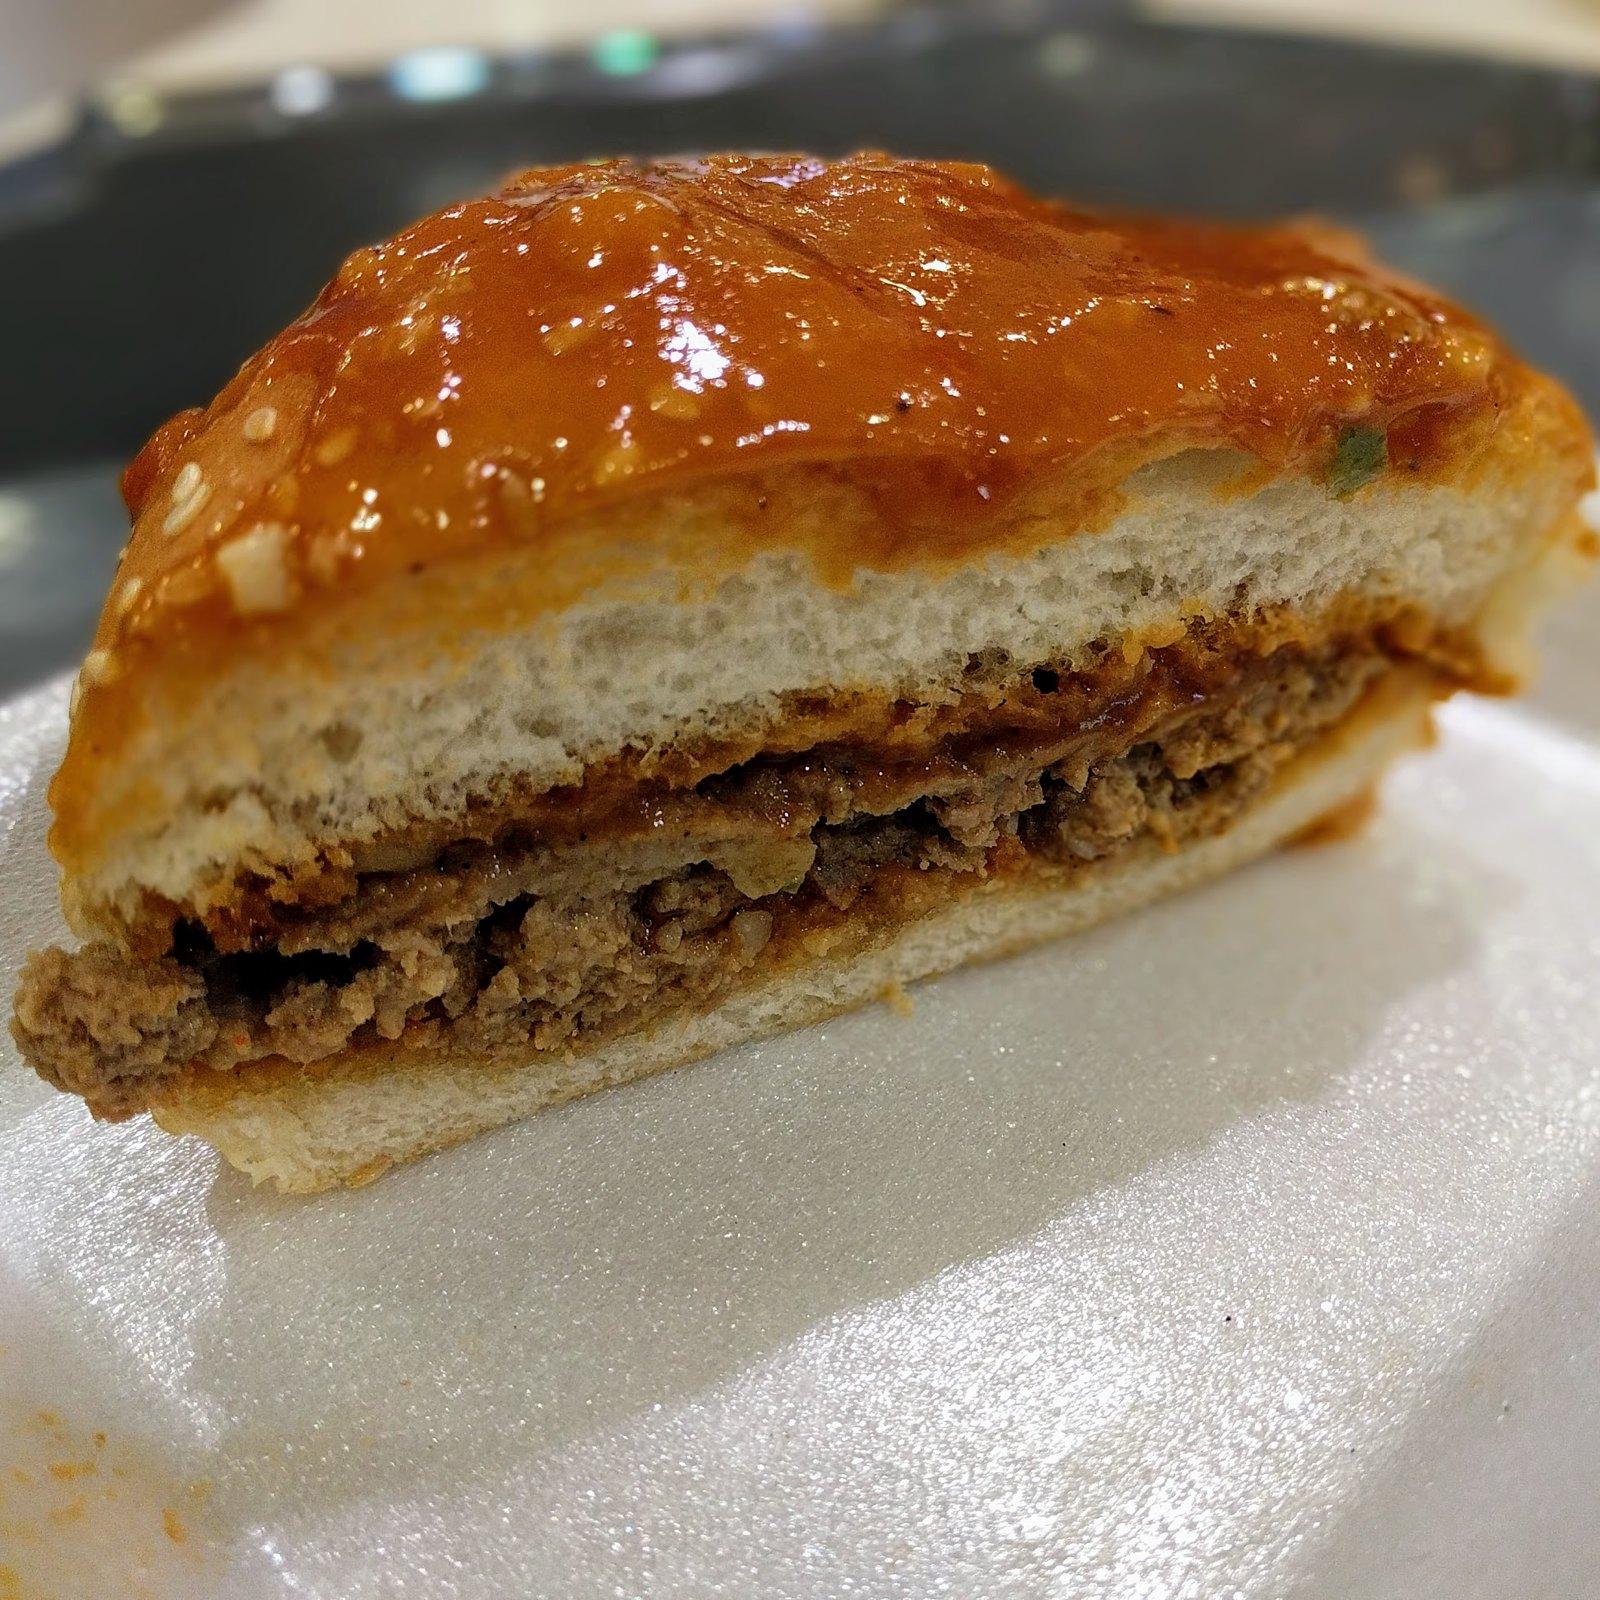 Islak Burger